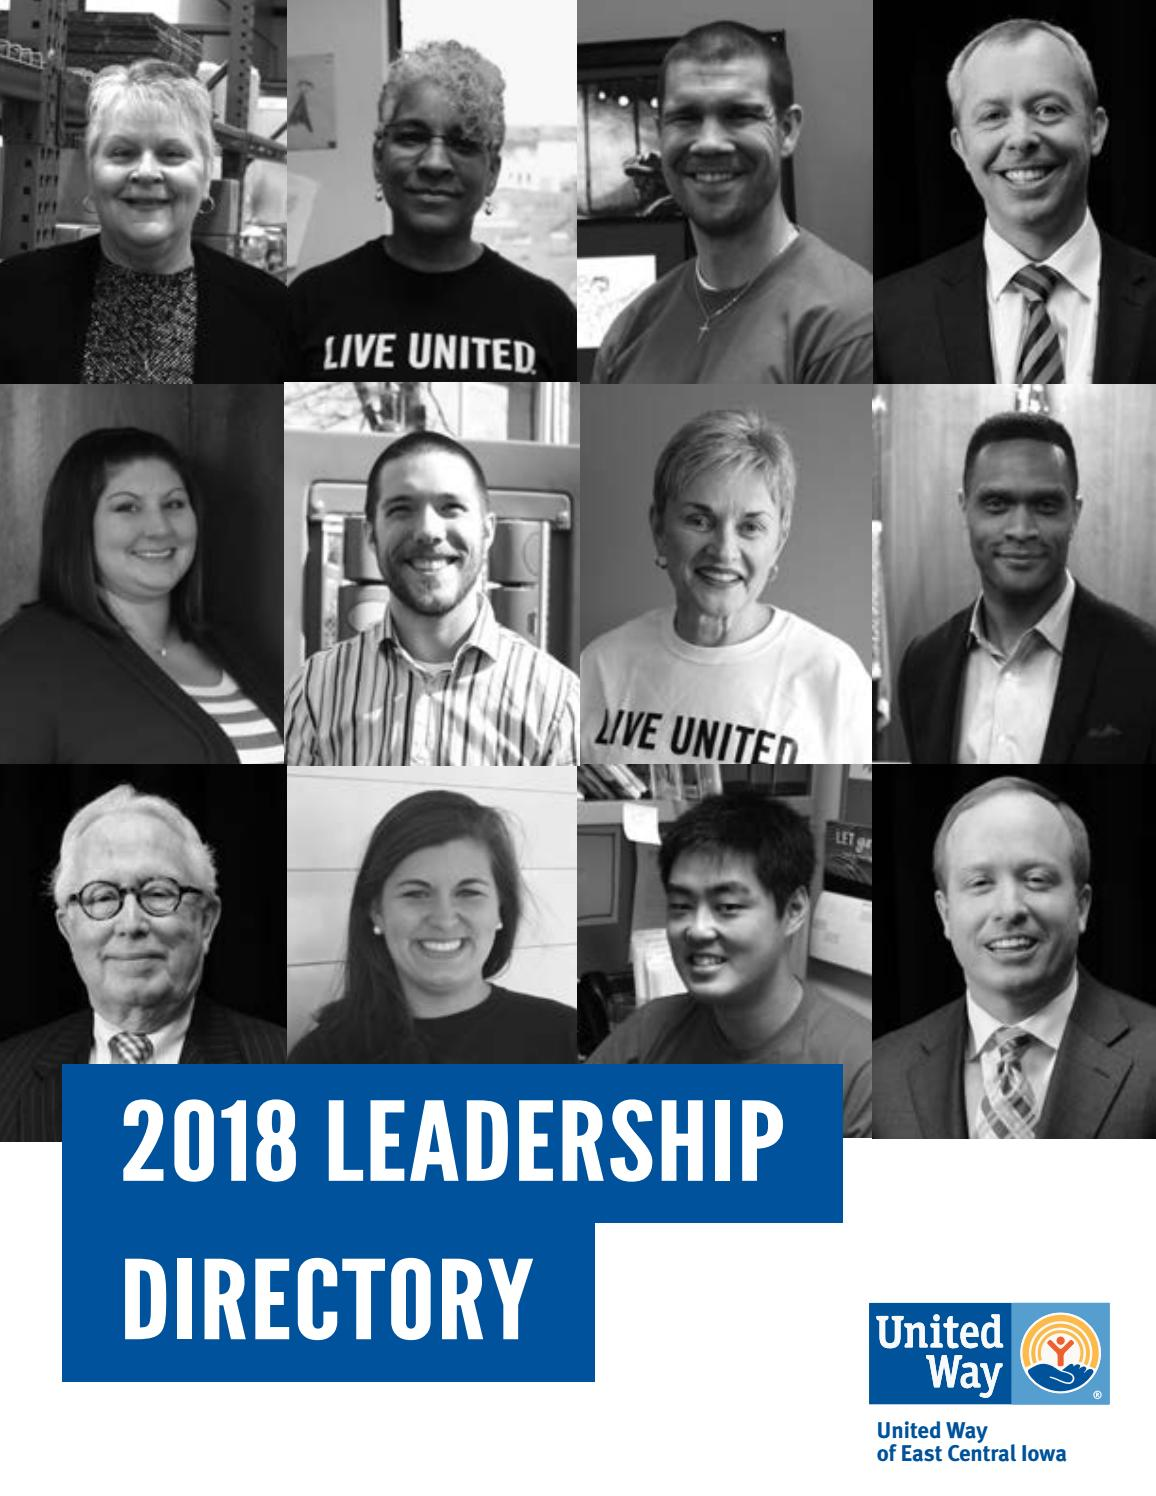 2018 leadership directory